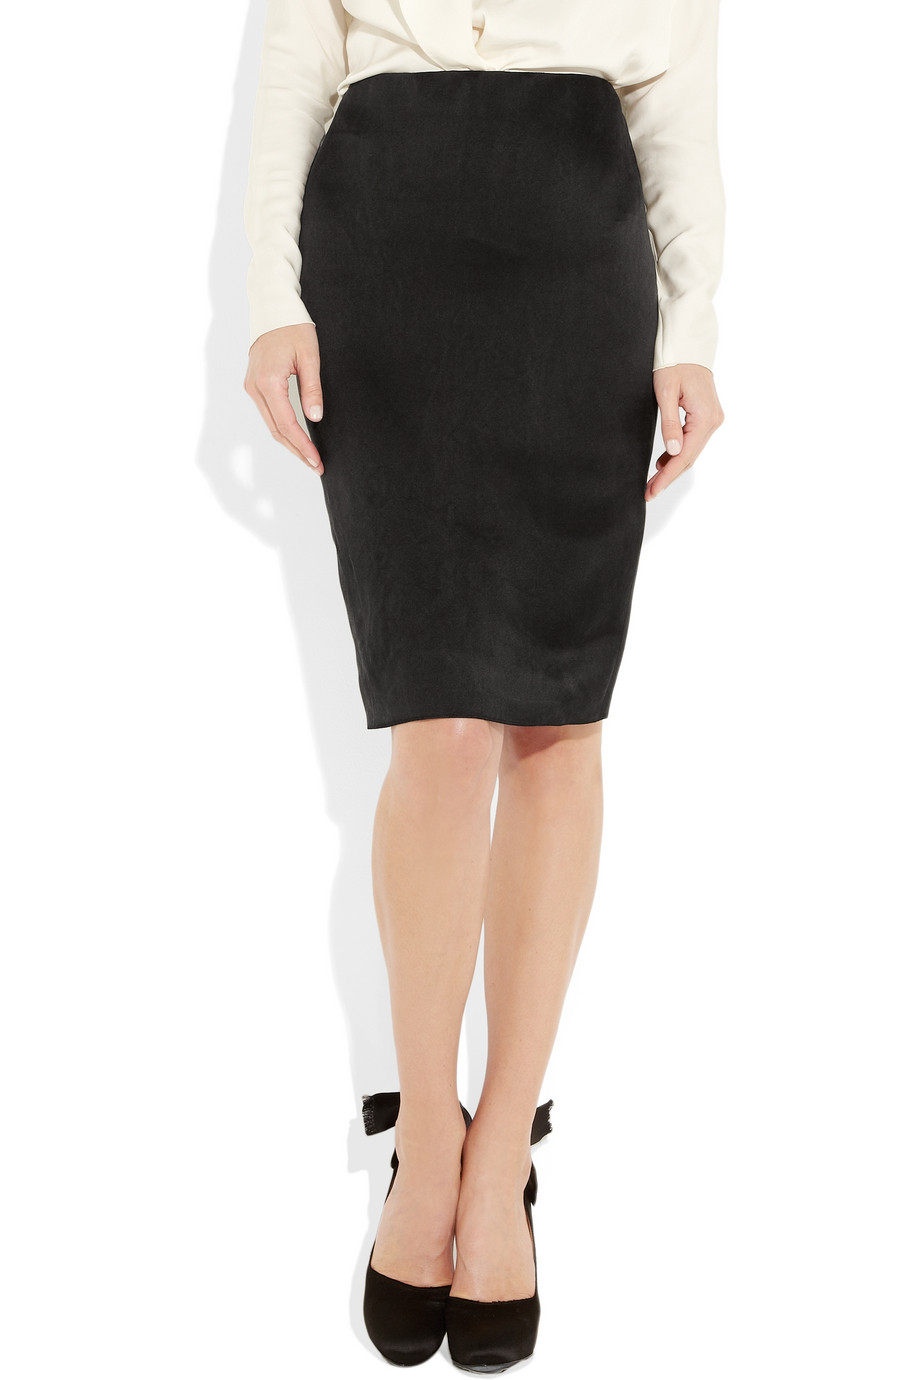 lanvin duchess satin pencil skirt in black lyst